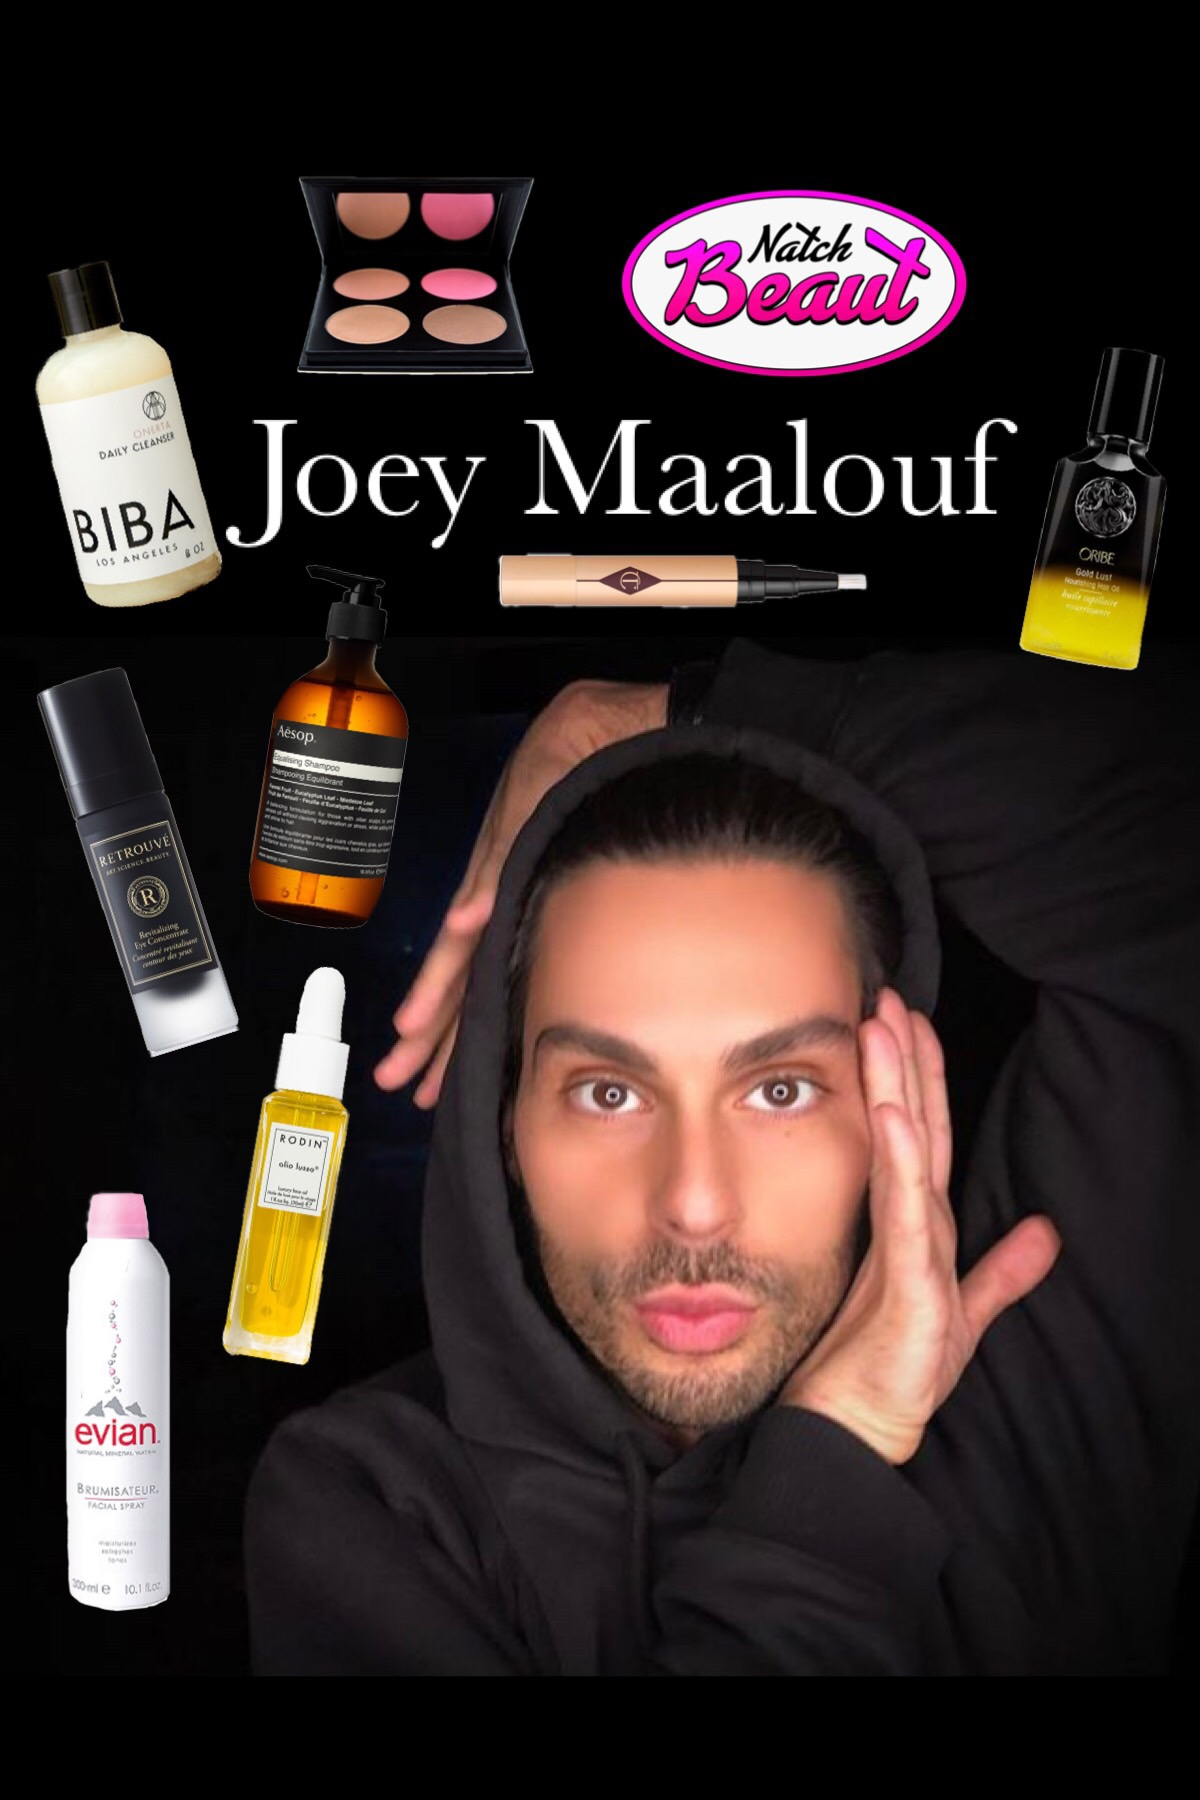 Makeup Artist Joey Maalouf